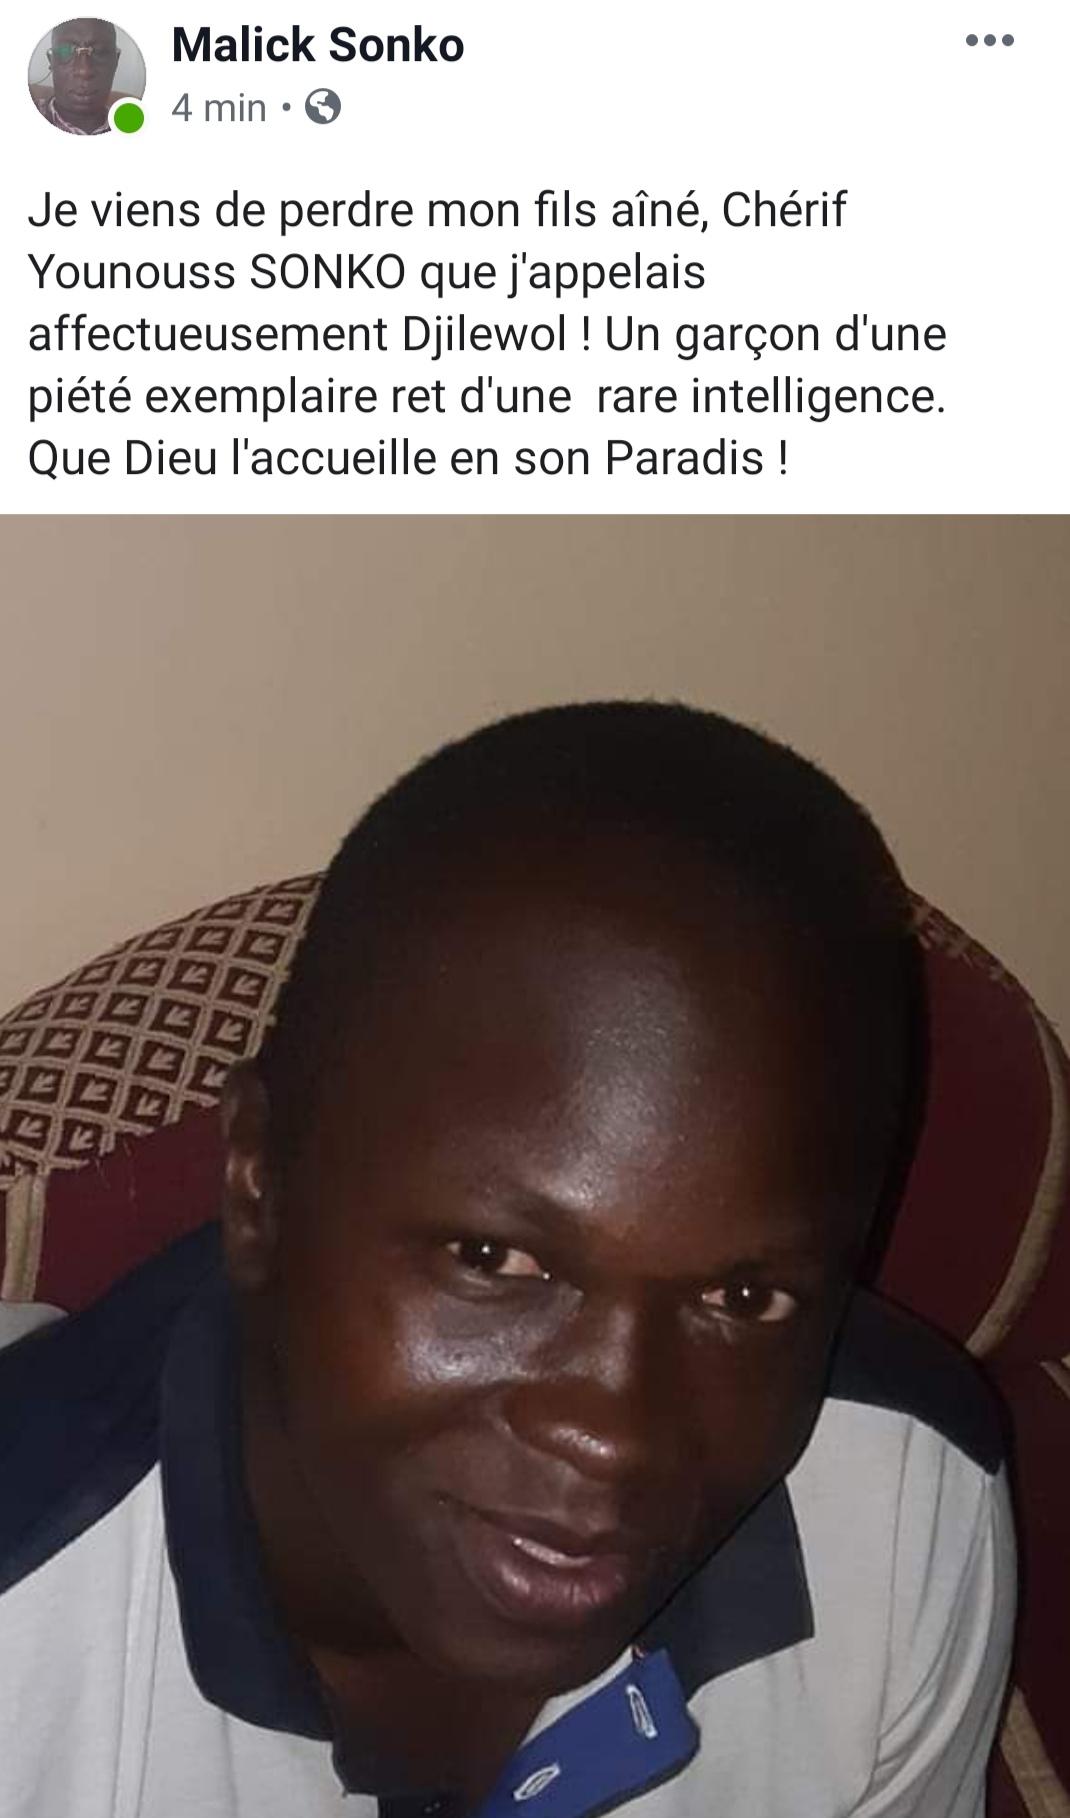 Ziguinchor : Malick Sonko perd son fils aîné